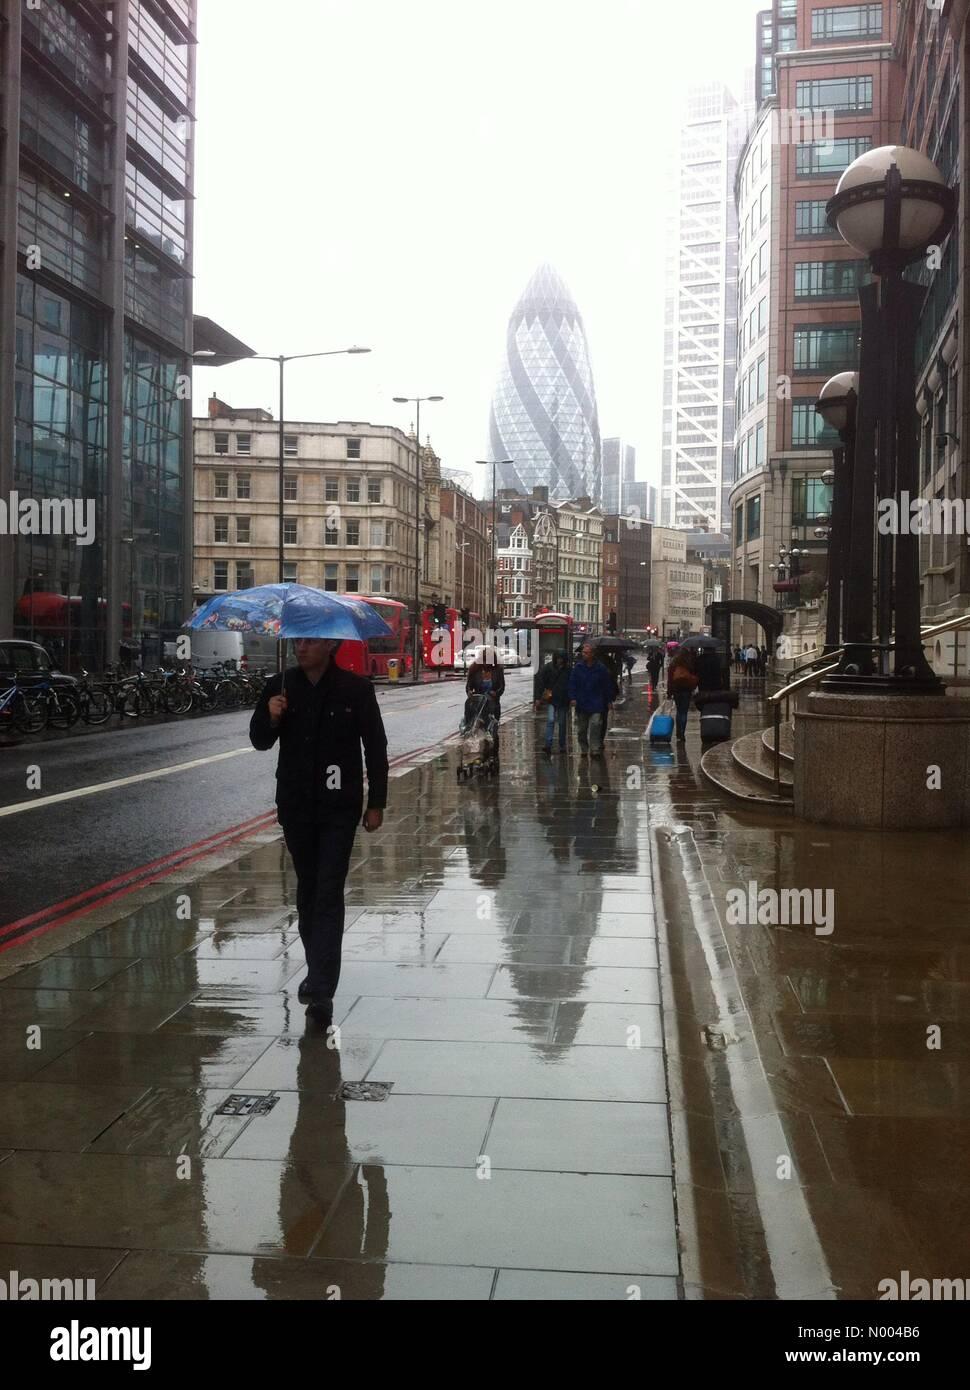 Uk Weather Another Rainy Day On Londons Bishopsgate  Credit Francesca Moore Stockimonews Alamy Live News